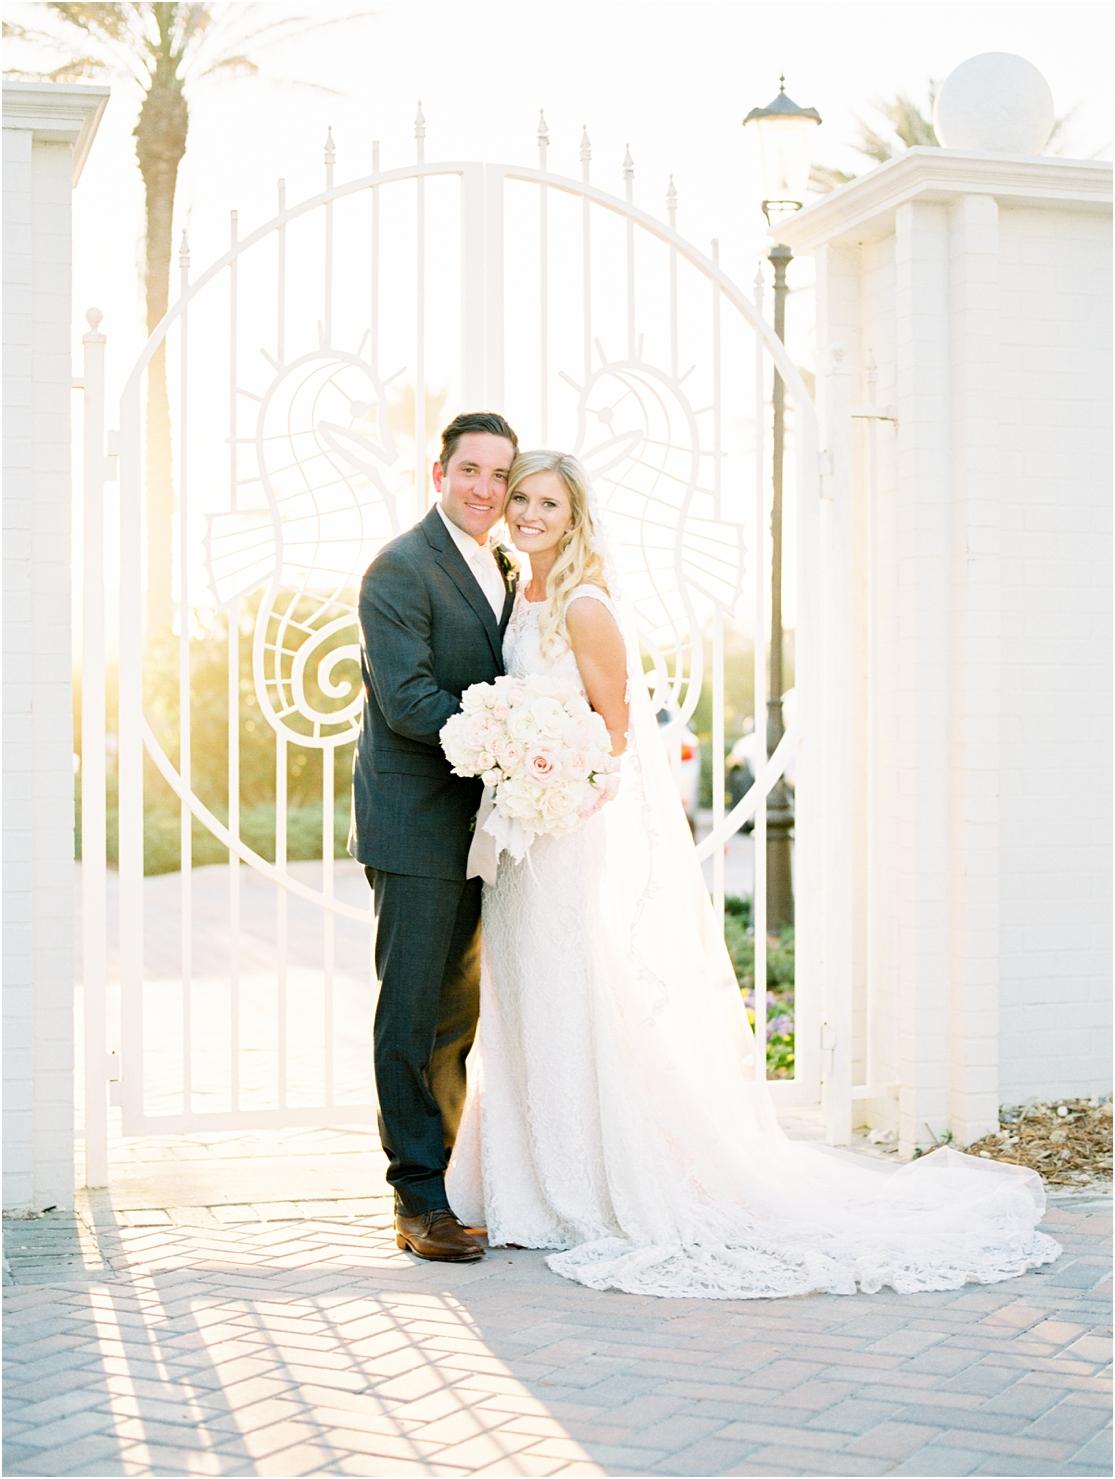 Lisa Silva Photography- Ponte Vedra Beach and Jacksonville, Florida Fine Art Film Wedding Photography- Wedding at the Ponte Vedra Inn and Club_0064.jpg